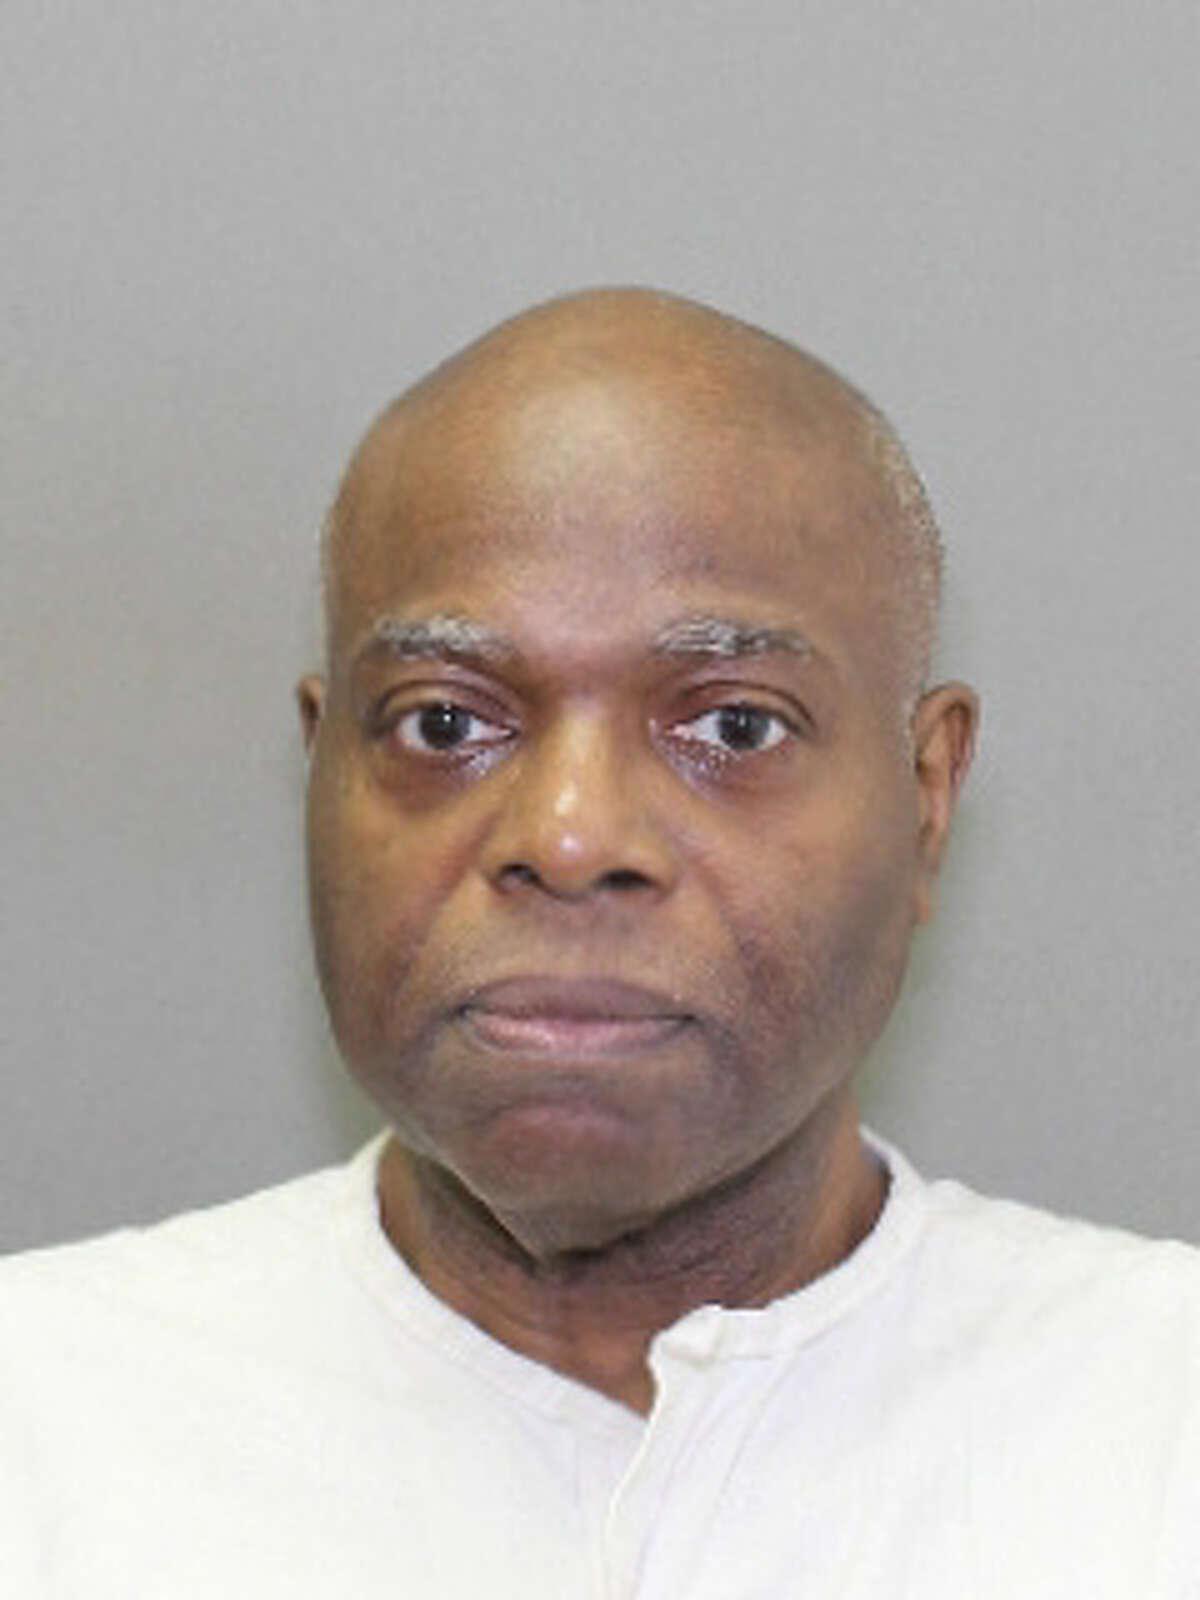 Michael Wayne Norris was taken off death row.